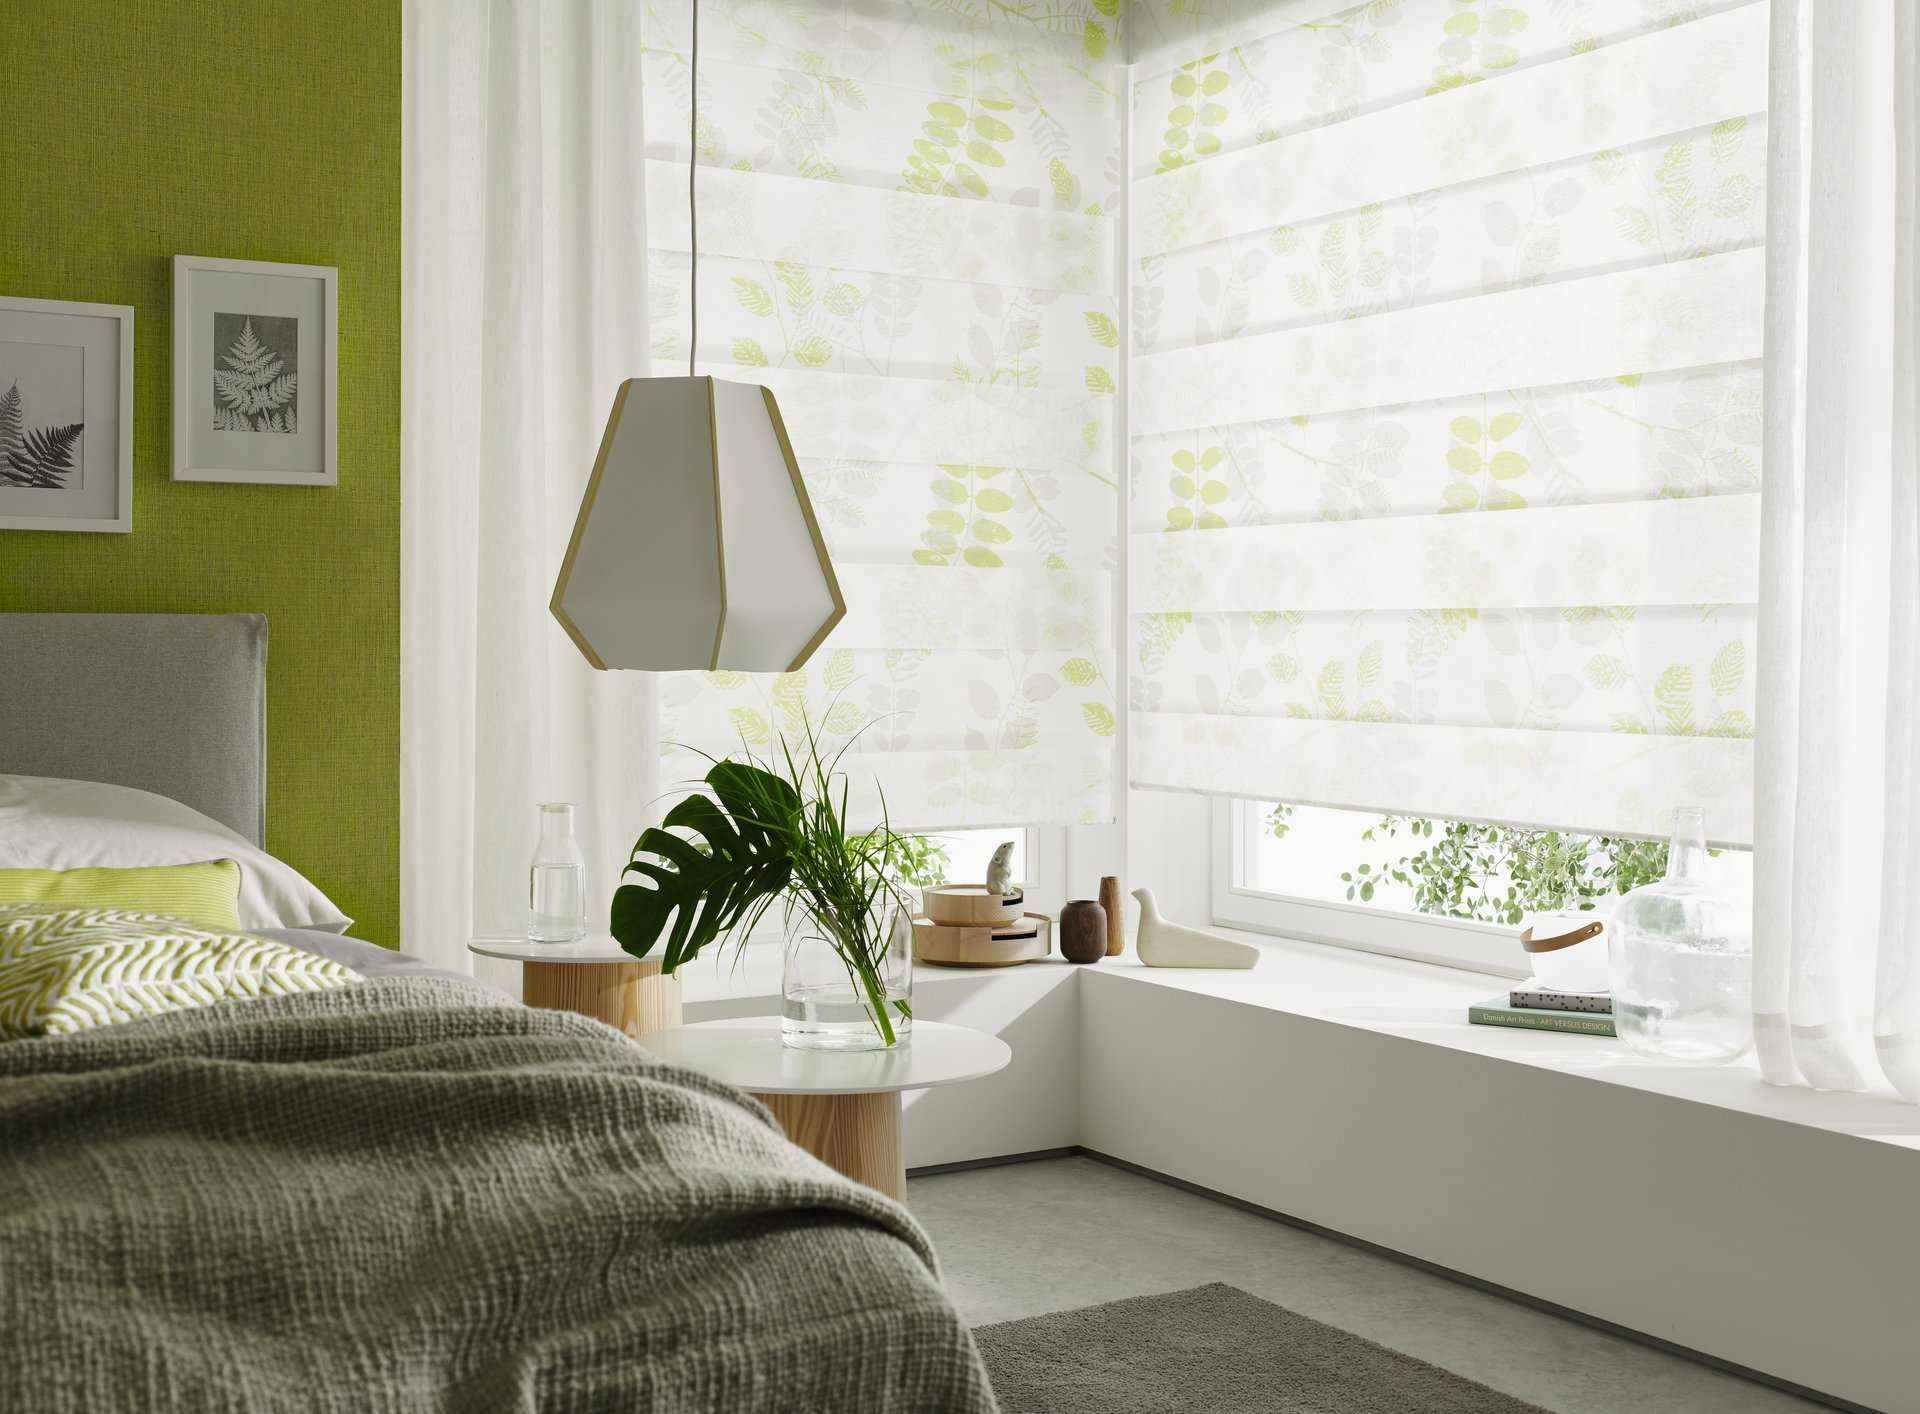 vitrage met vouwgordijnen in slaapkamer   Sfeerwand - Bohemien ...